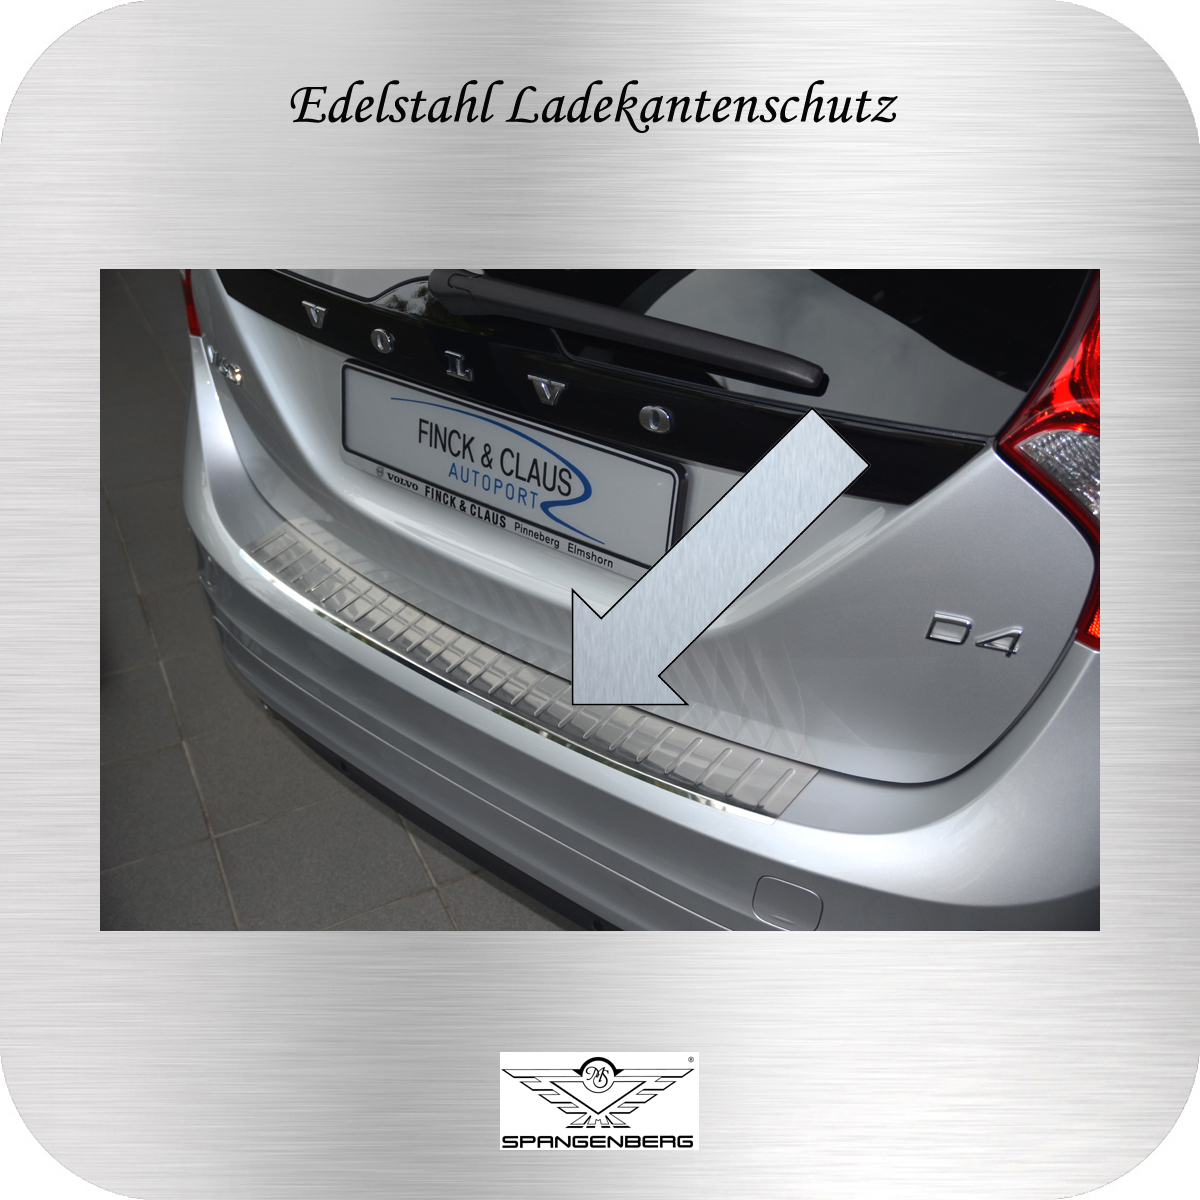 Ladekantenschutz Edelstahl Volvo V60 Kombi 2010- 3235722